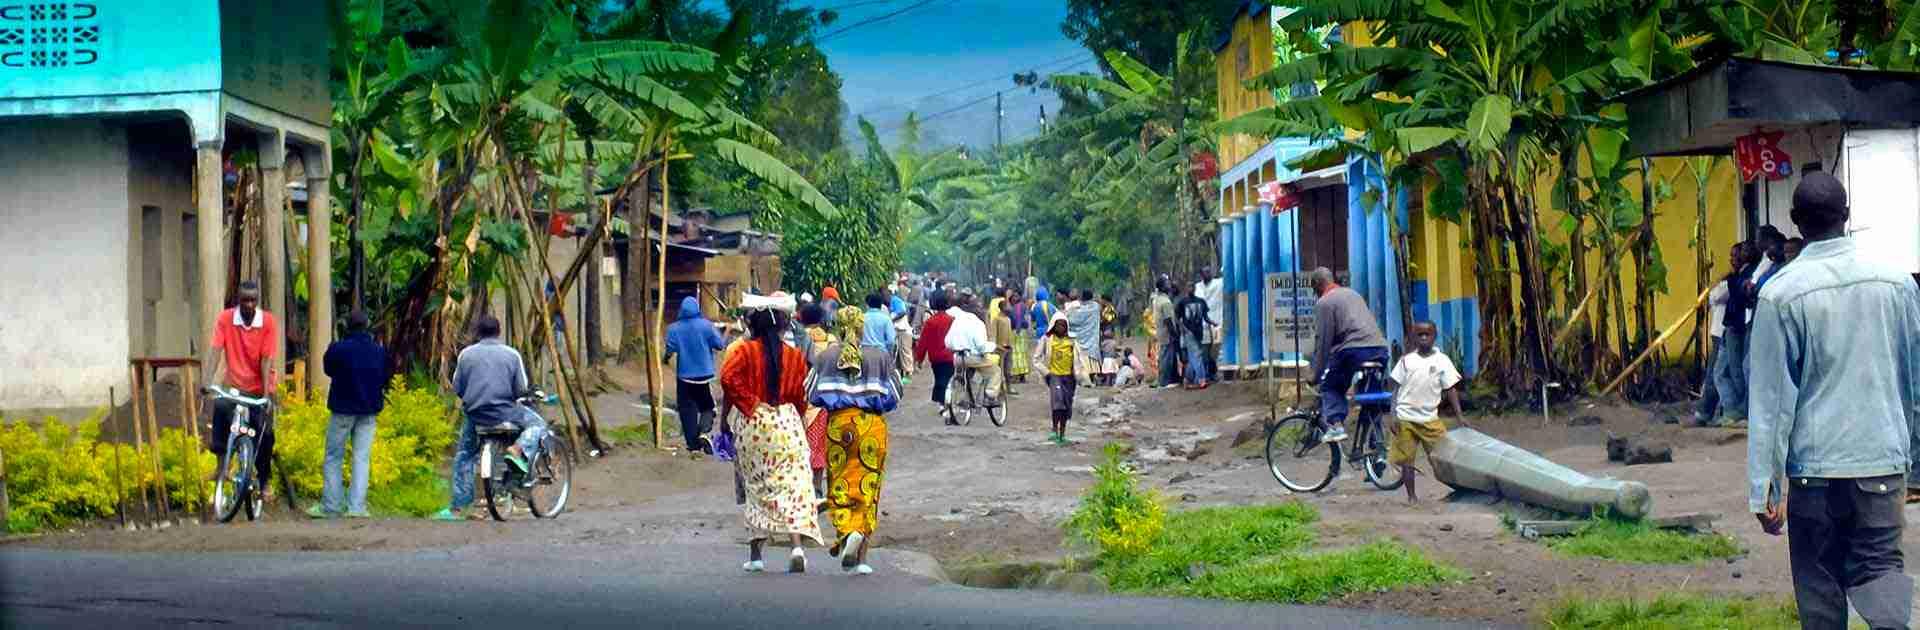 Kenya Rwanda Ouganda Congo Namibie Botswana